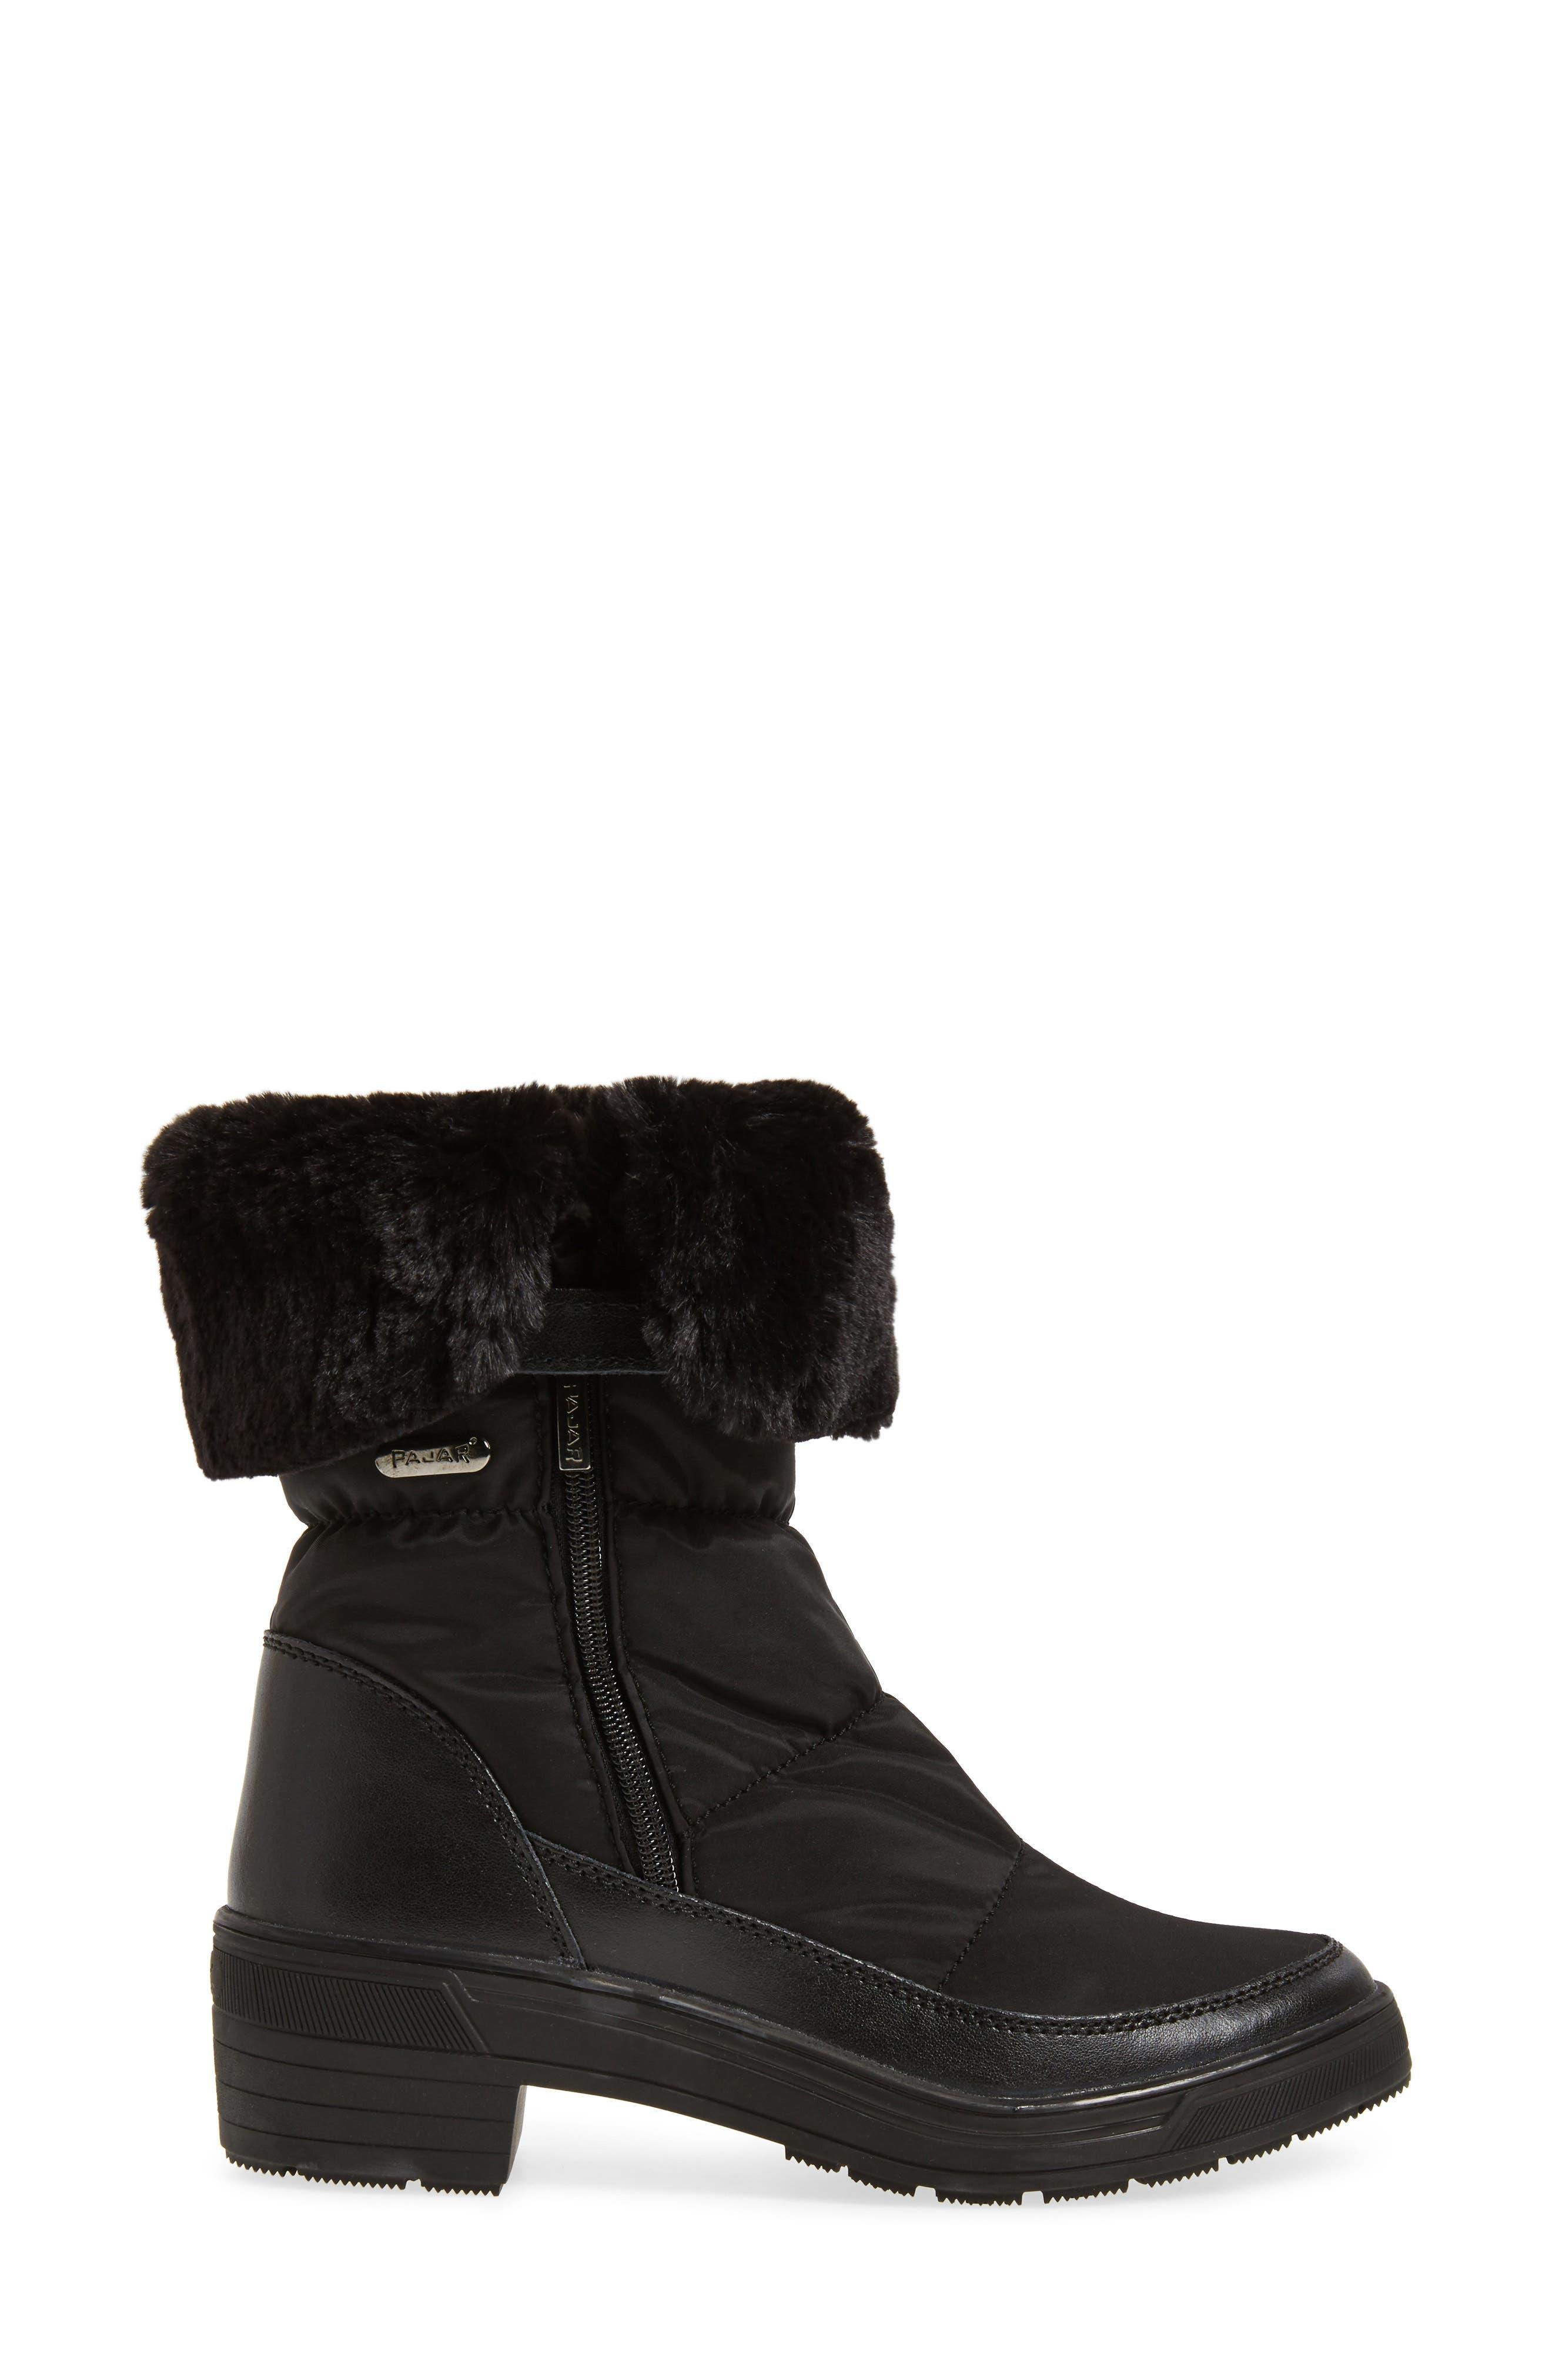 Ventura Weatherproof Faux Fur Lined Boot,                             Alternate thumbnail 3, color,                             001